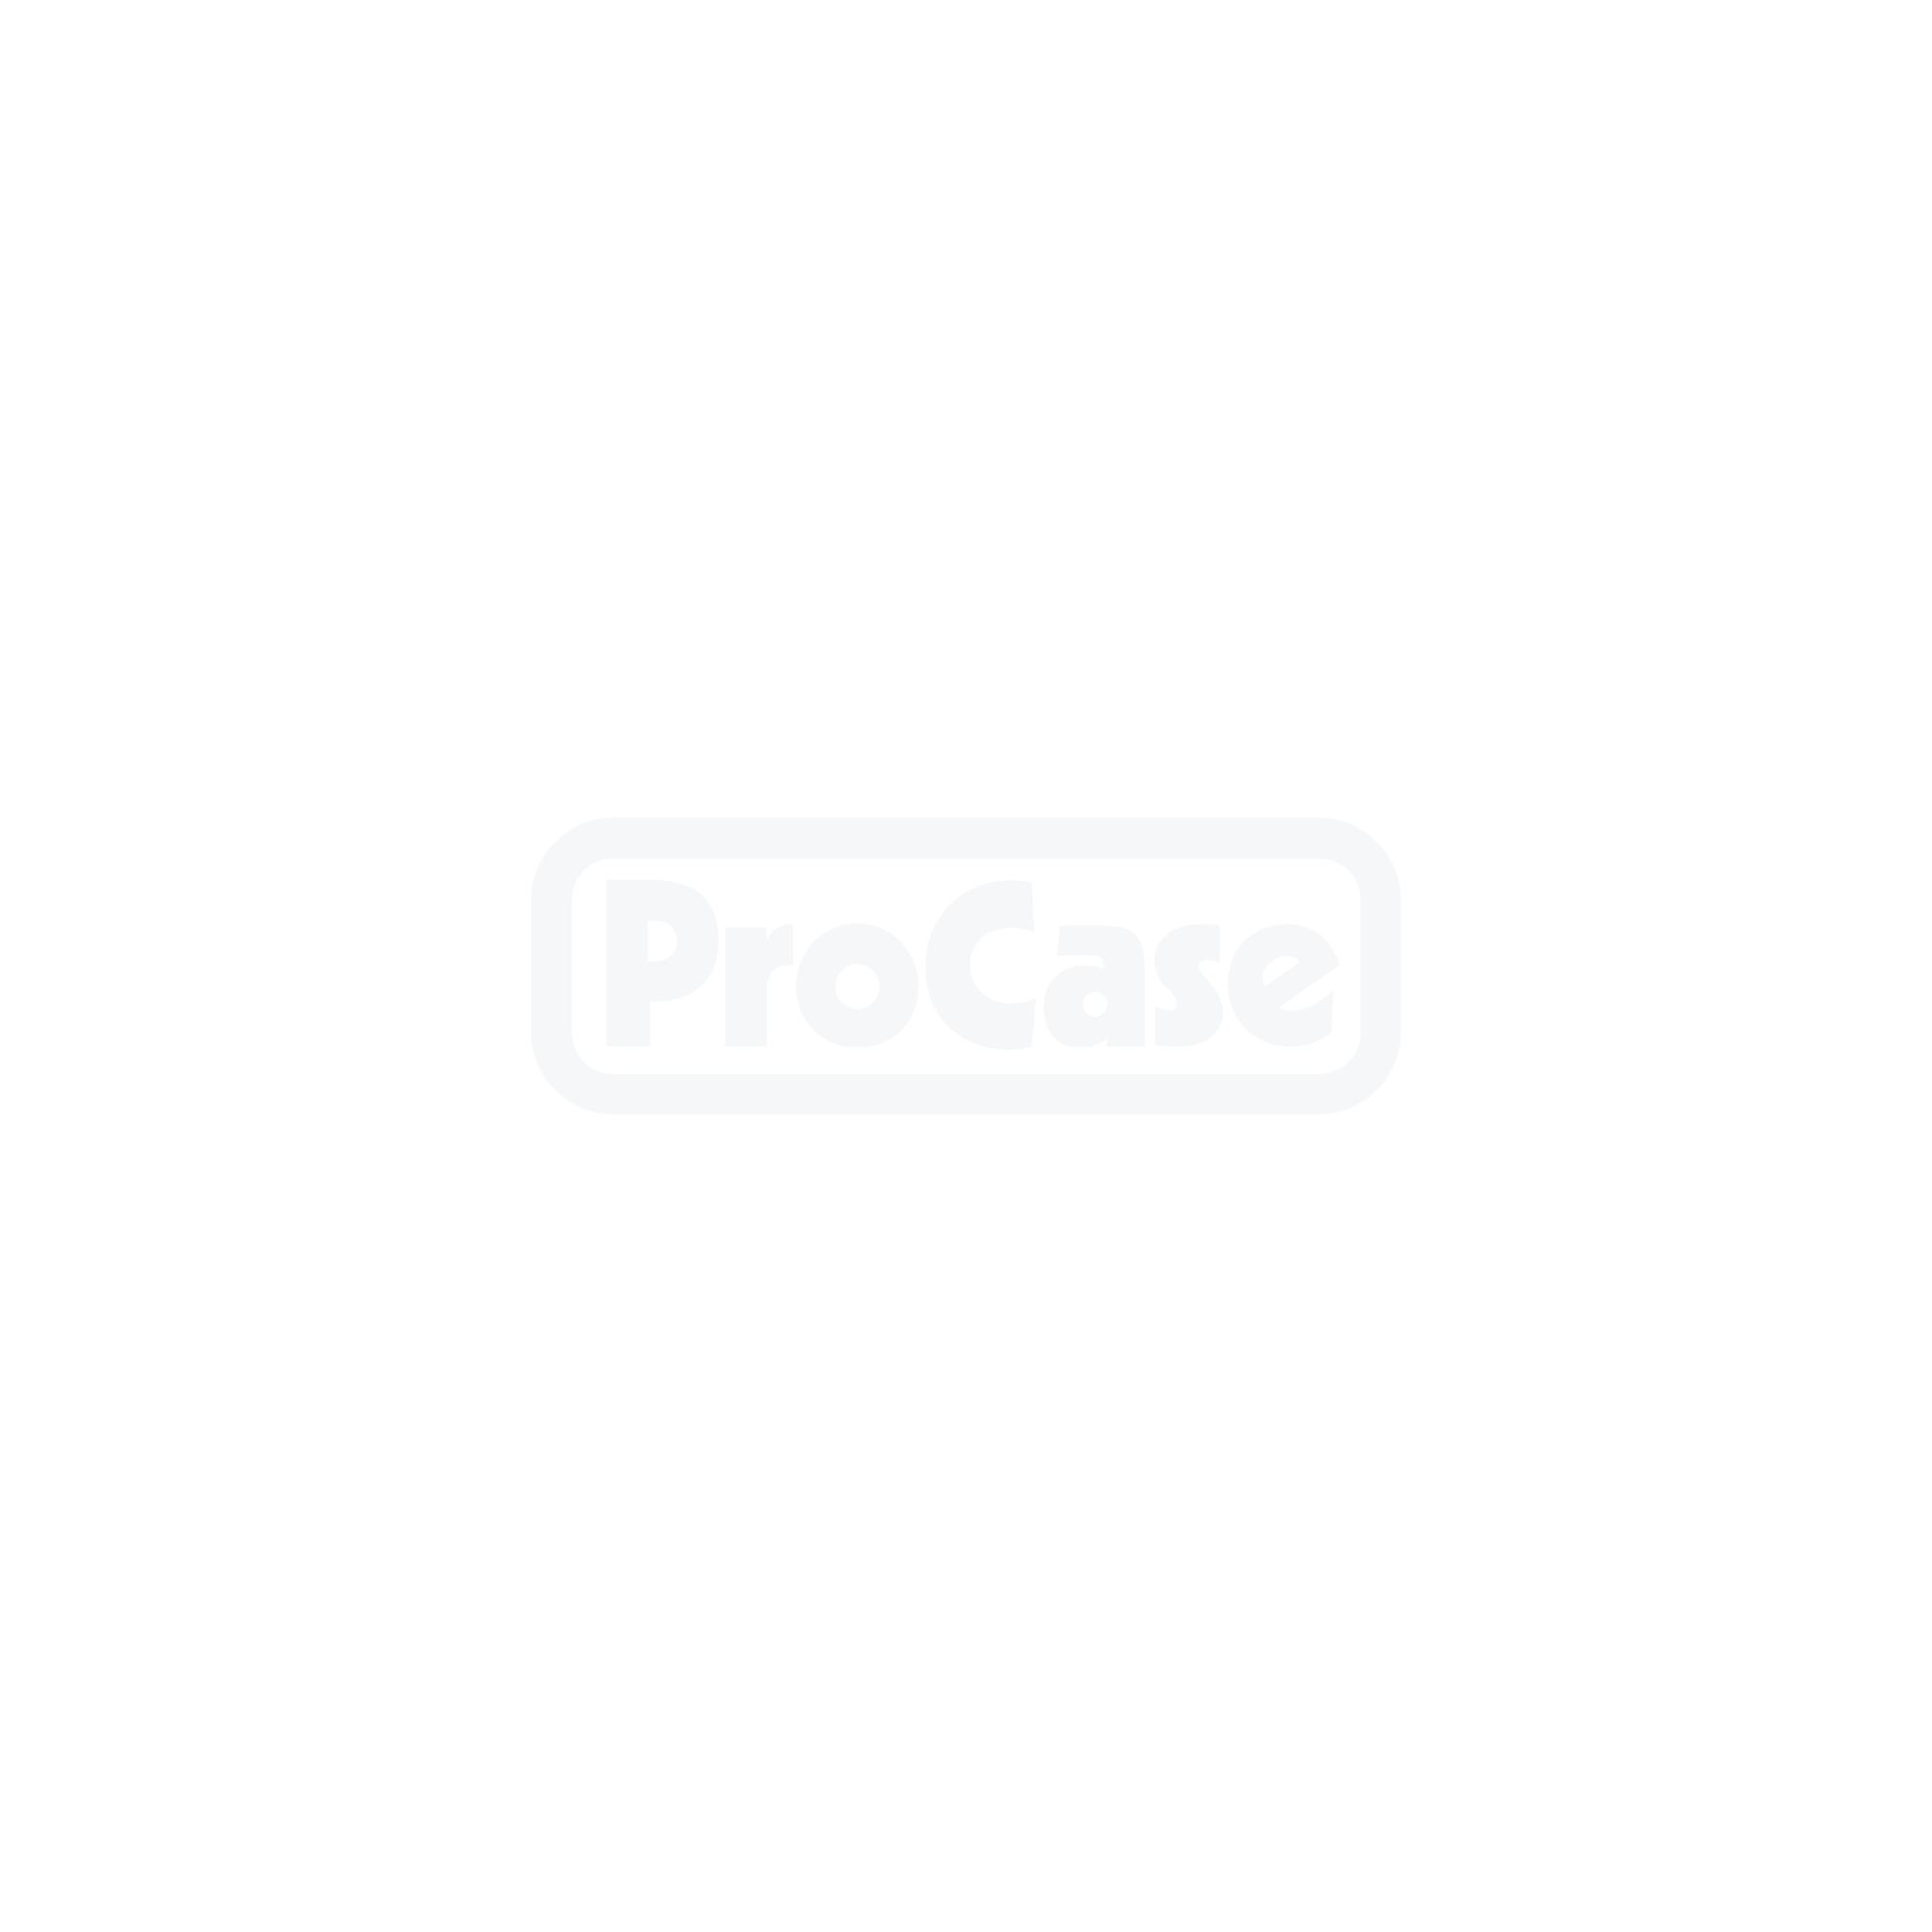 Flightcase für 4 JB Lighting P12 Profile 3